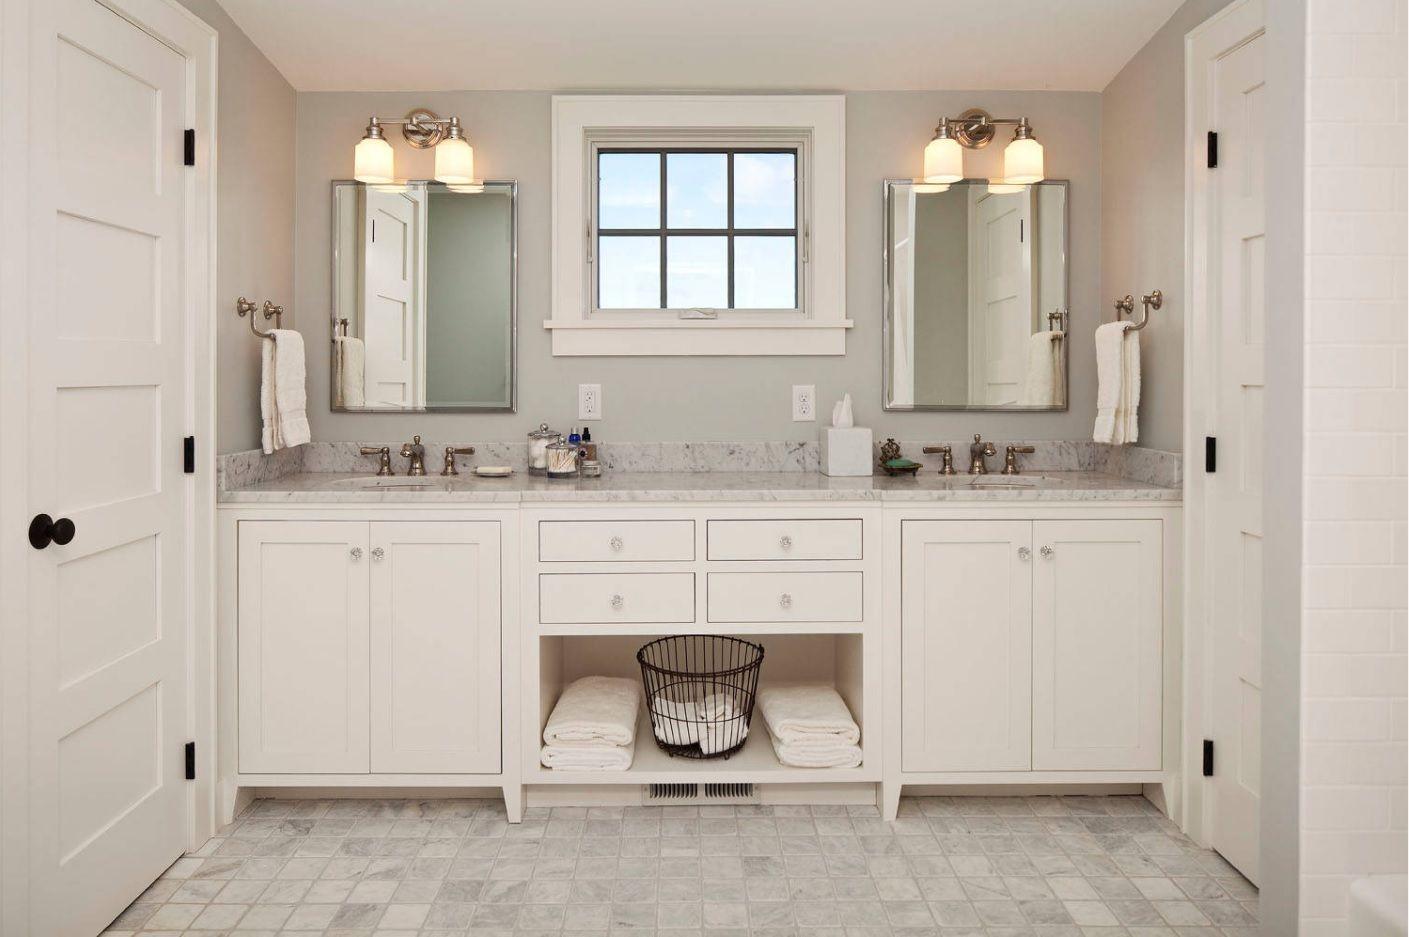 Jack And Jill Bathroom Designs Best Kitchen Gallery Rachelxblog - Jack and jill bathroom remodel ideas